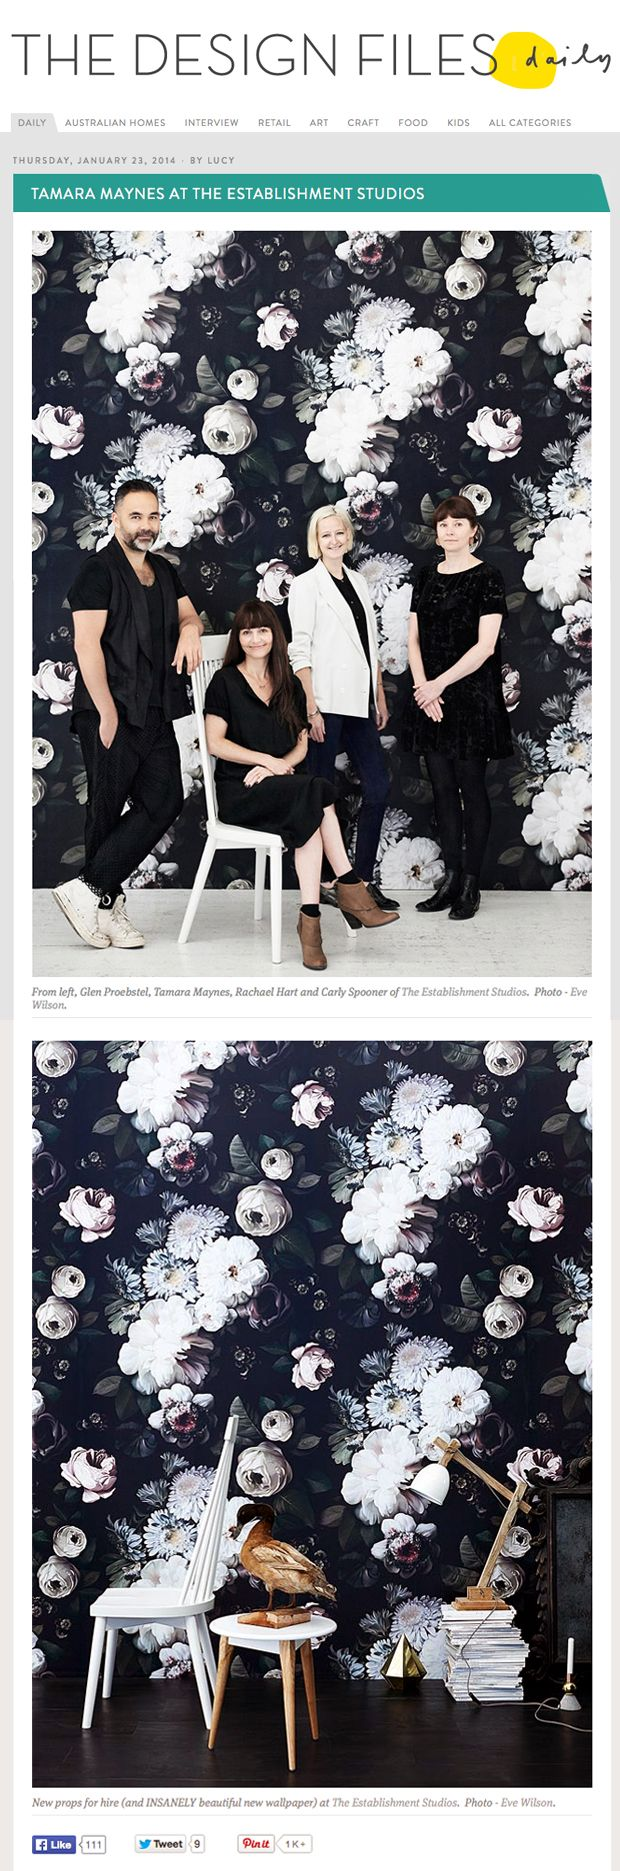 Black floral print wallpaper dark floral wallpaper by ellie cashman - Ellie Cashman Dark Floral Wallpaper As Featured On The Design Files Australia S 1 Design